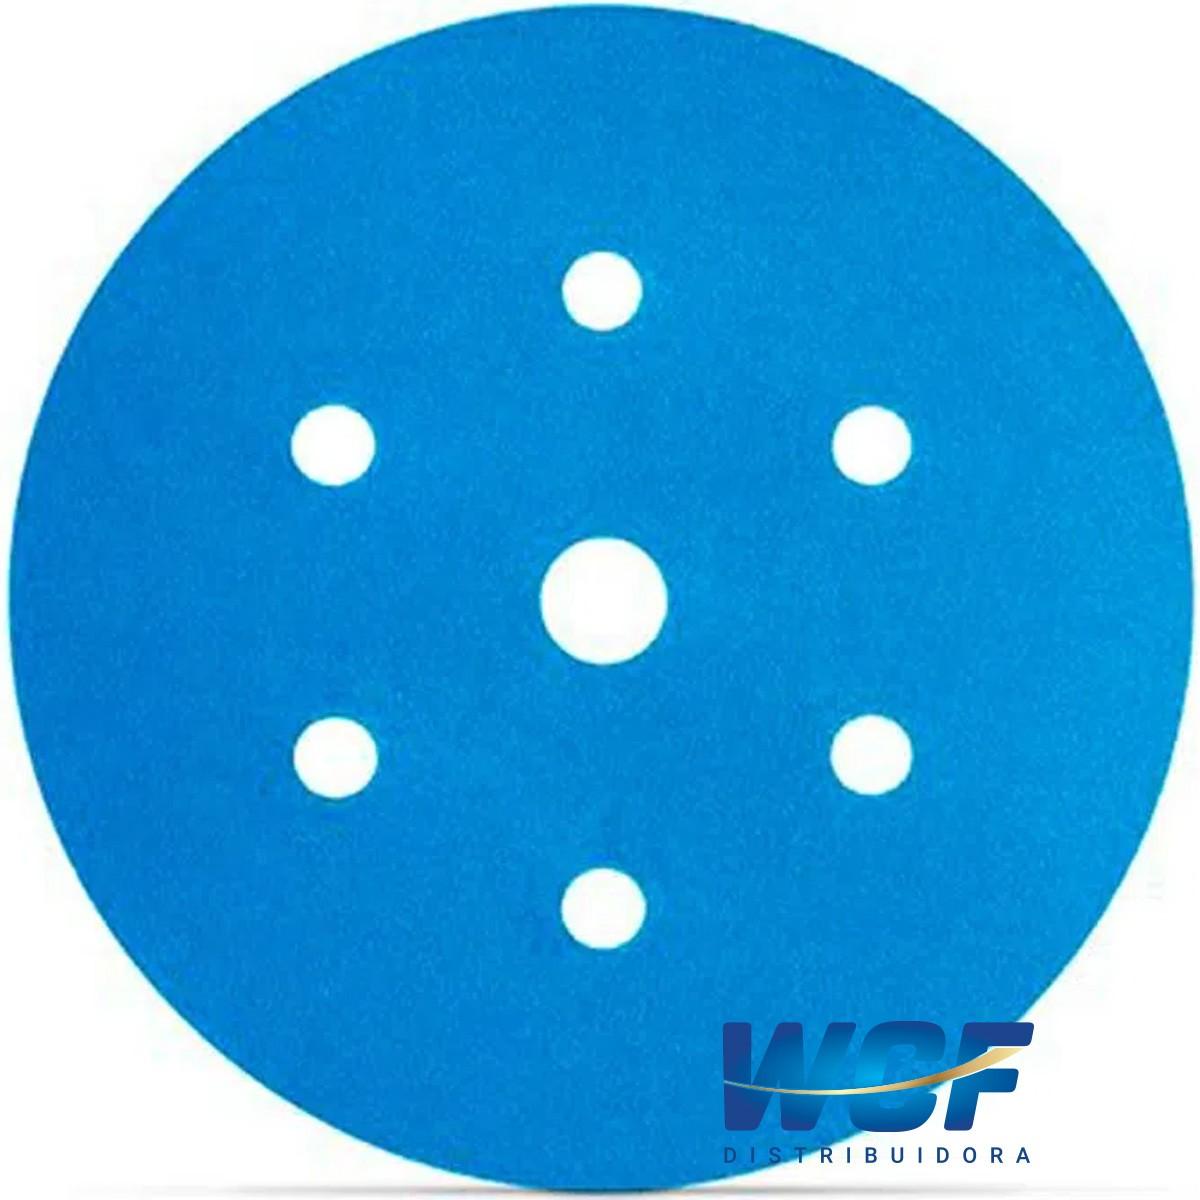 3M DISCO BLUE 800